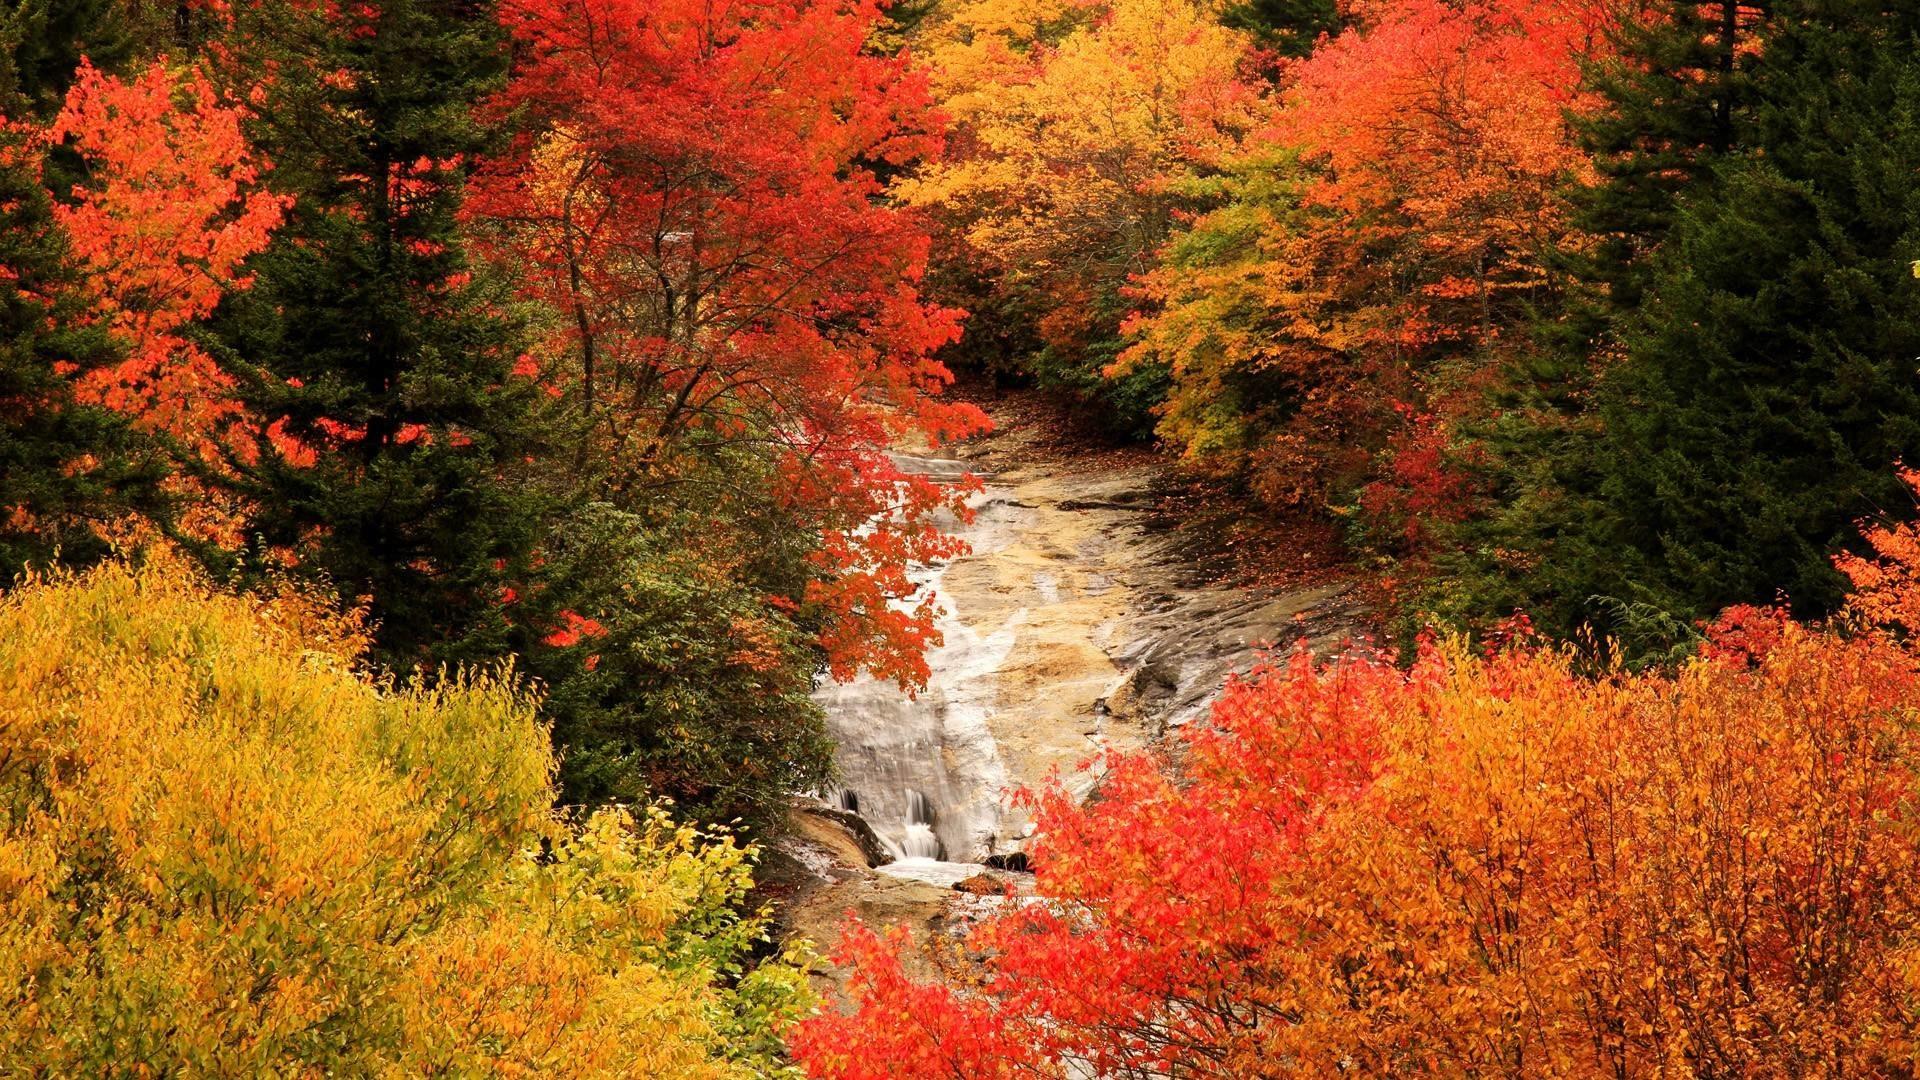 Autumn wallpaper background free.